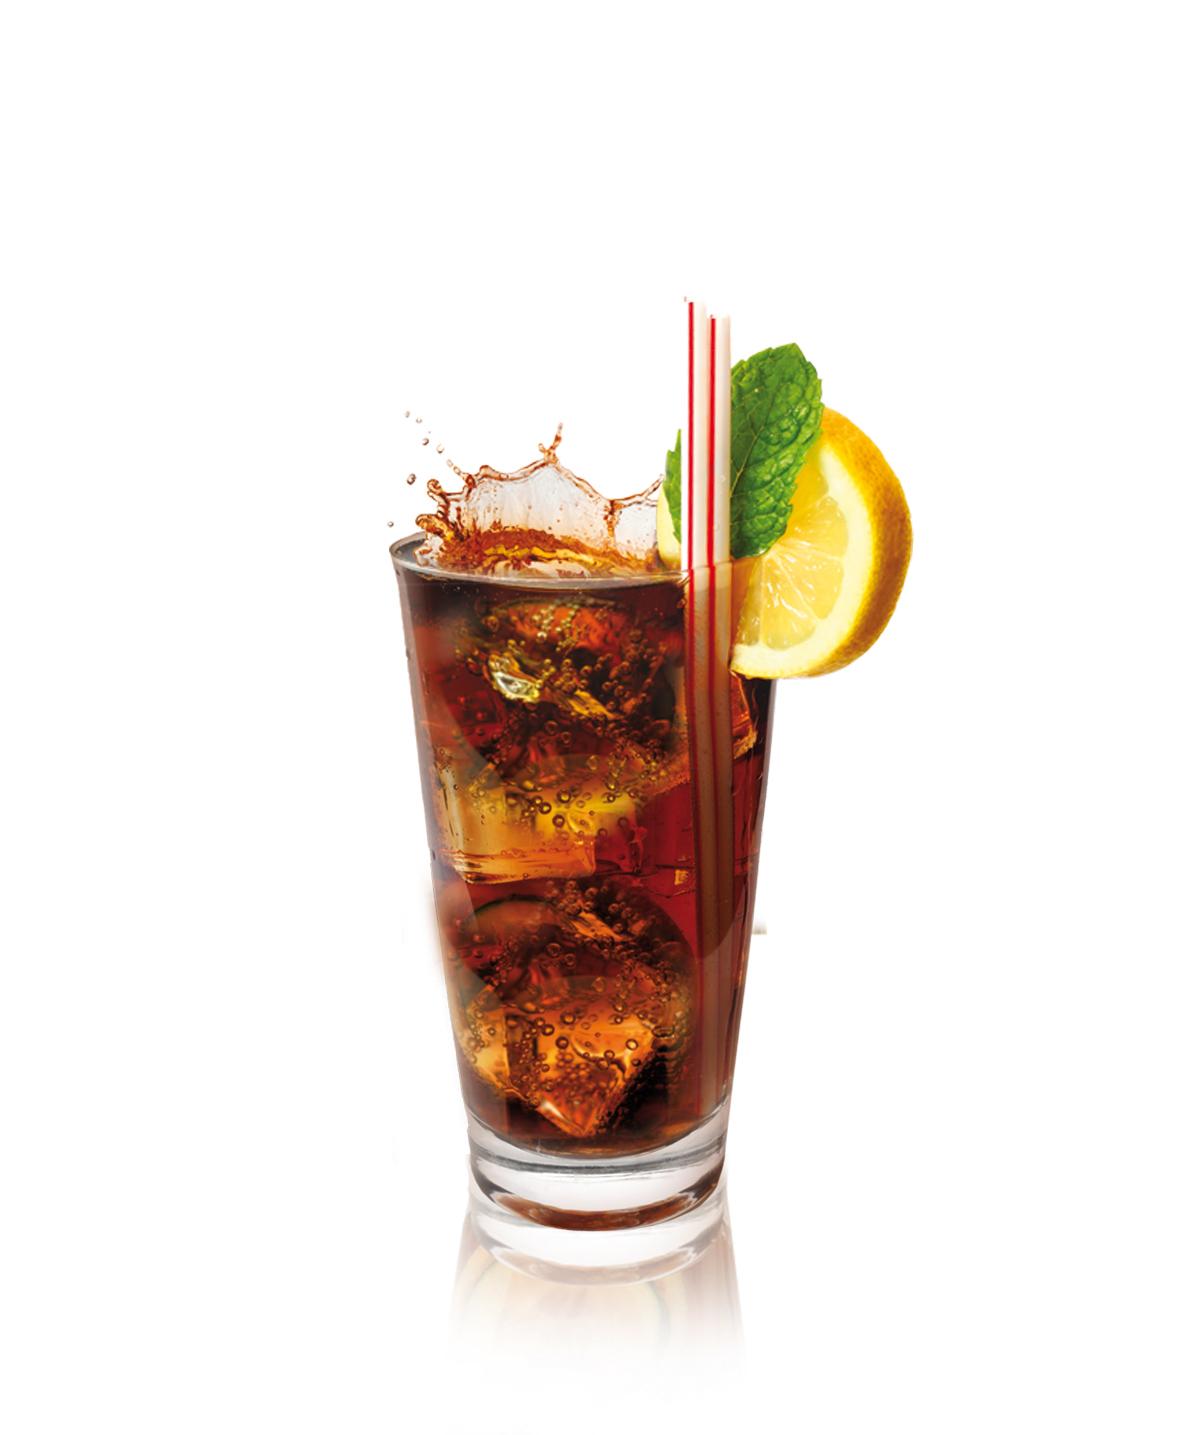 Cuba libre коктейль рецепт